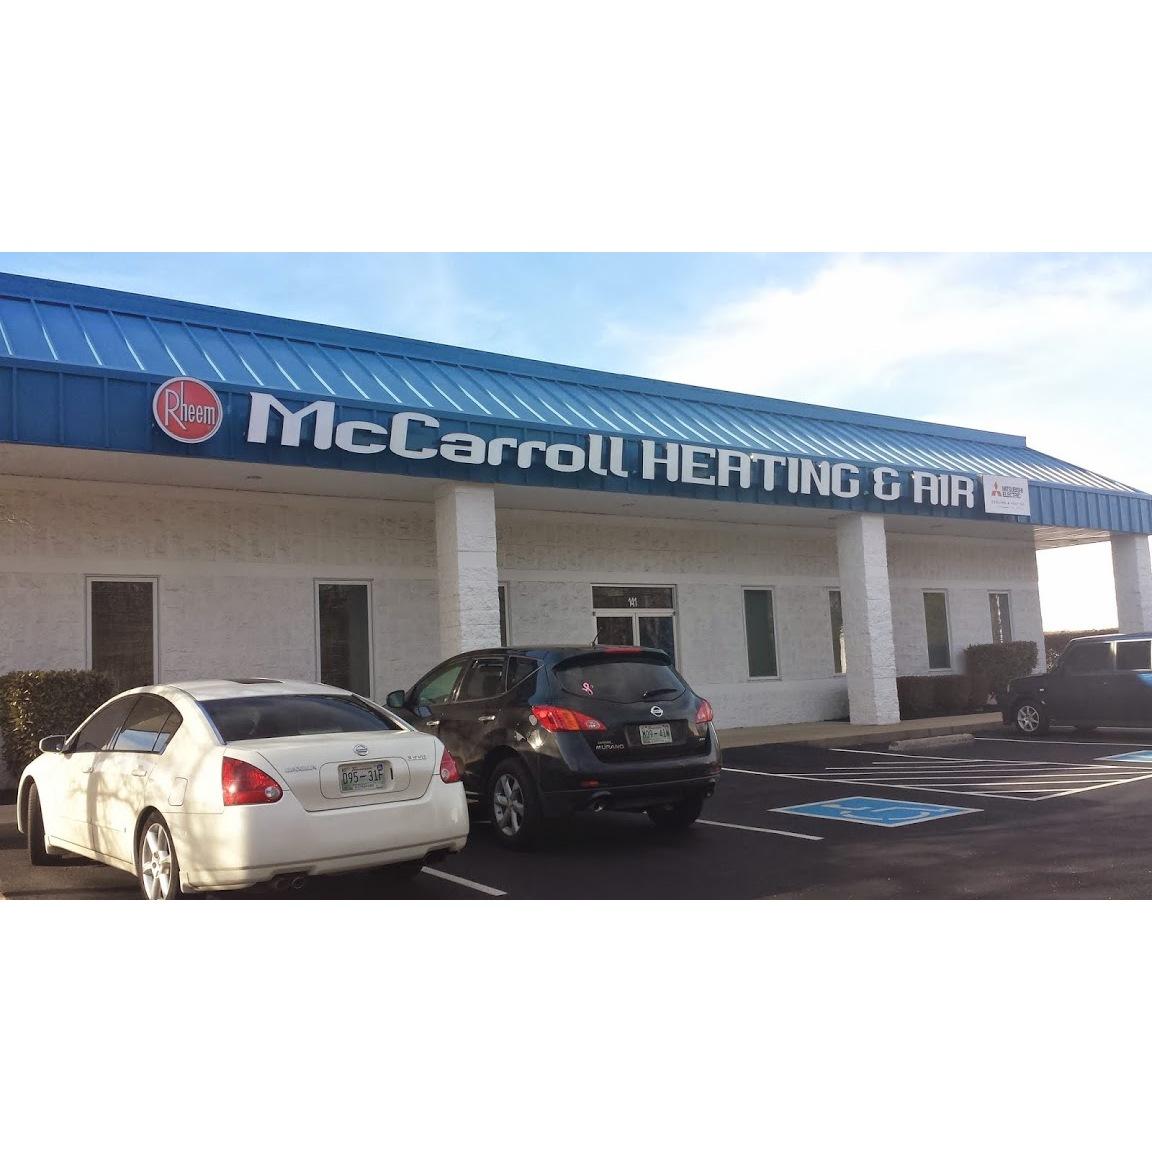 McCarroll Heating & Air - Hendersonville, TN 37075 - (615)824-4844 | ShowMeLocal.com